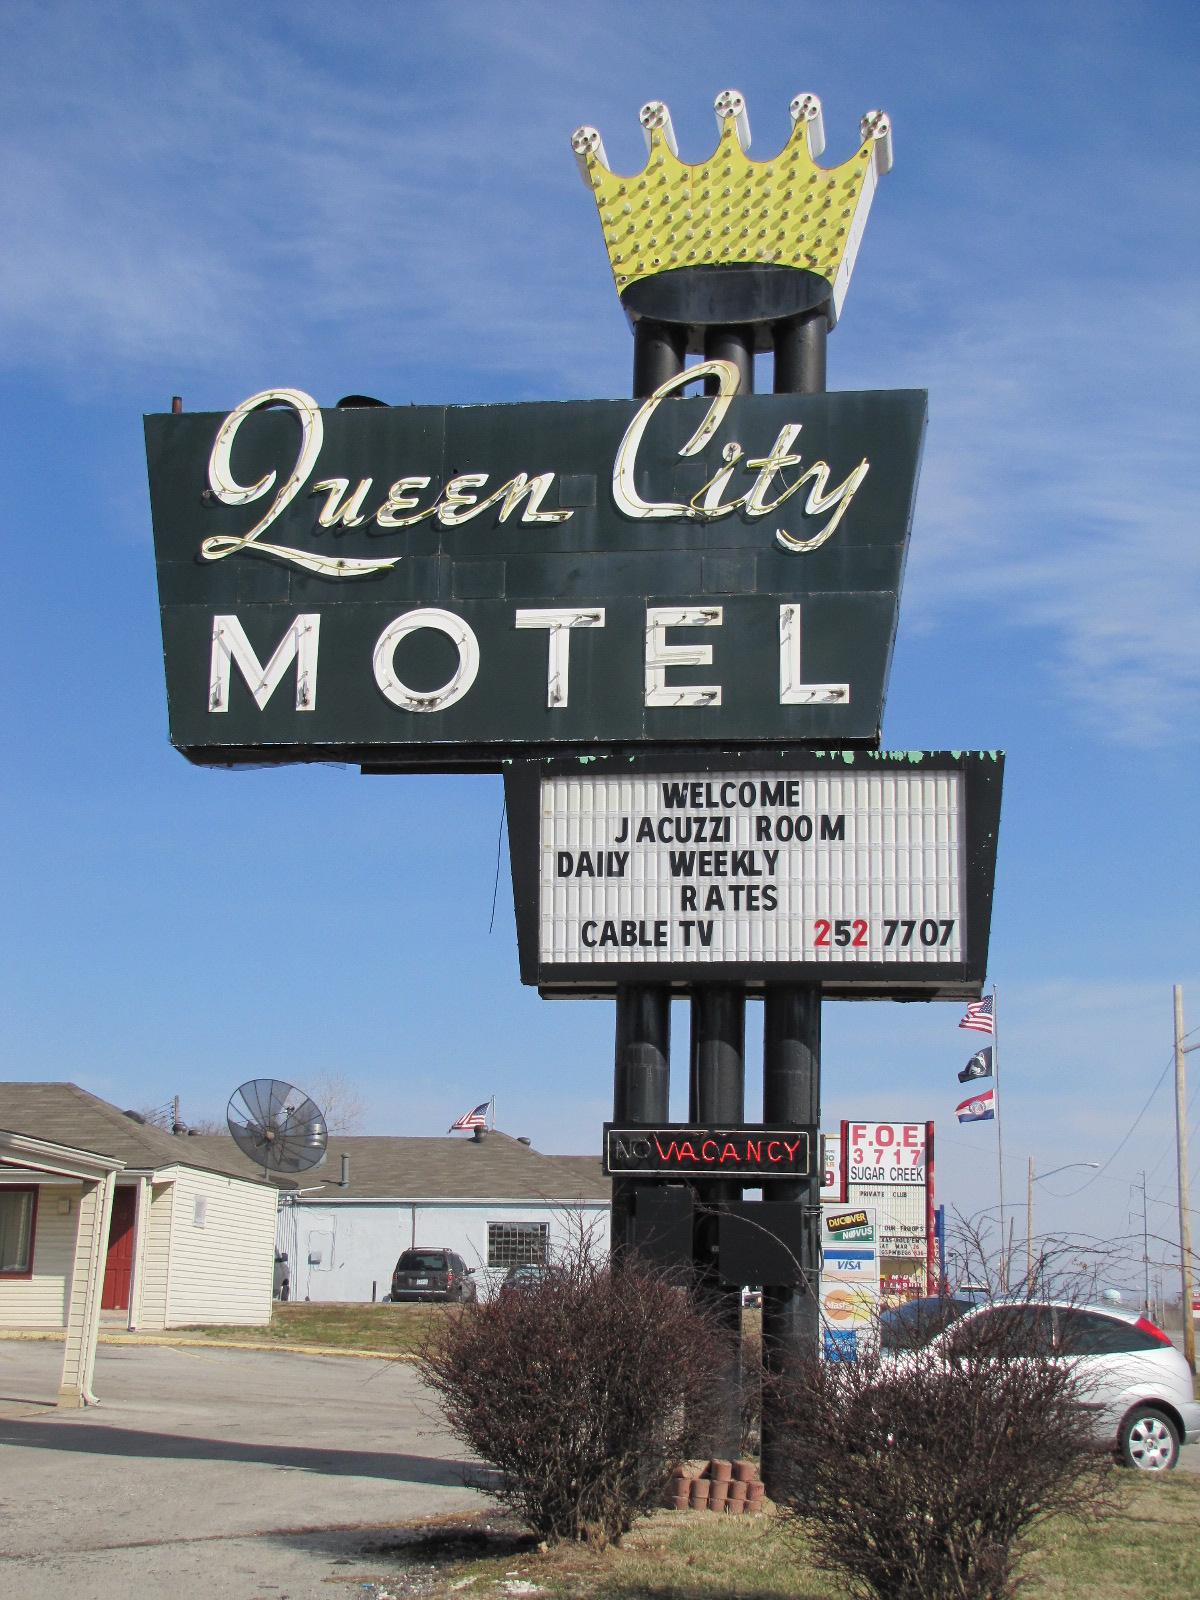 Queen City Motel - Sugar Creek, Missouri U.S.A. - March 6, 2011